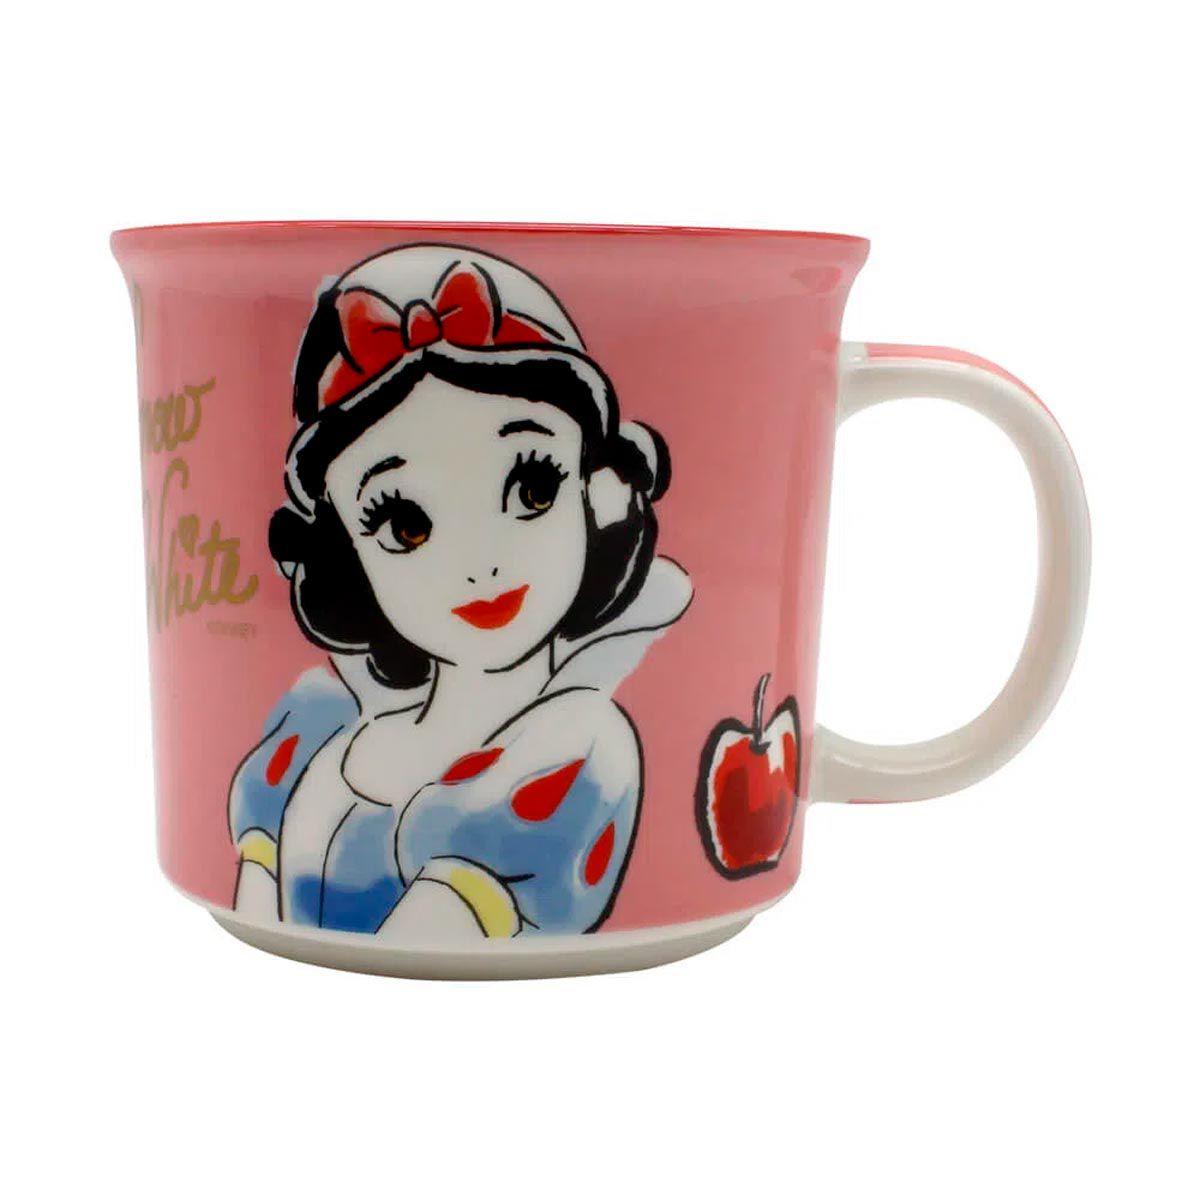 Kit Copo Térmico e Caneca Princesa Branca de Neve Disney